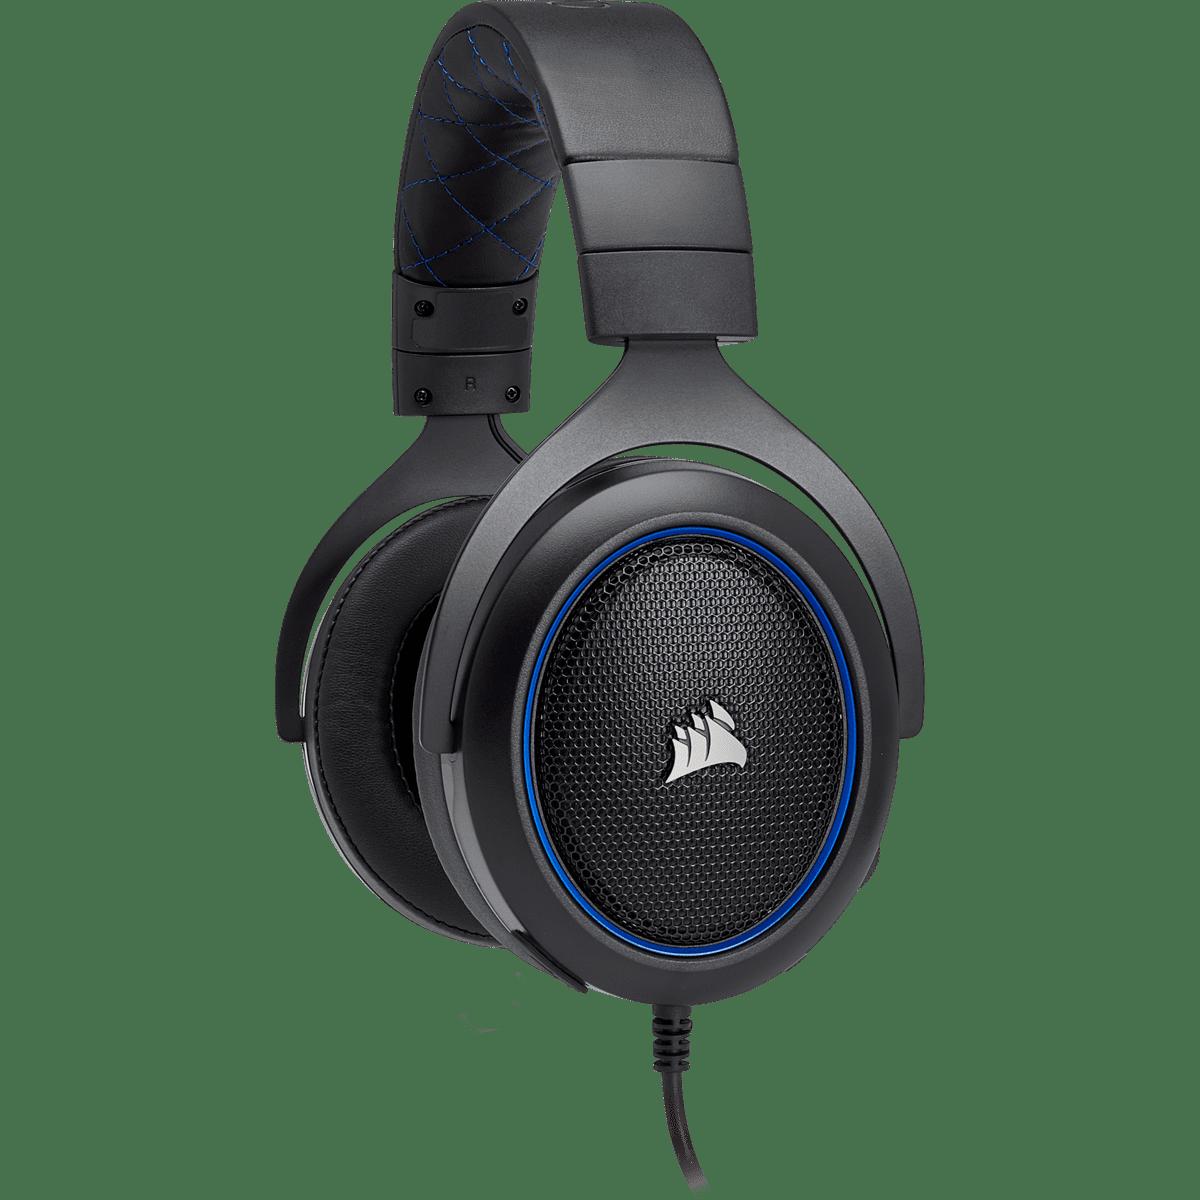 Headset Corsair Raptor HS50 Azul PC/PS4 CA-9011172-NA